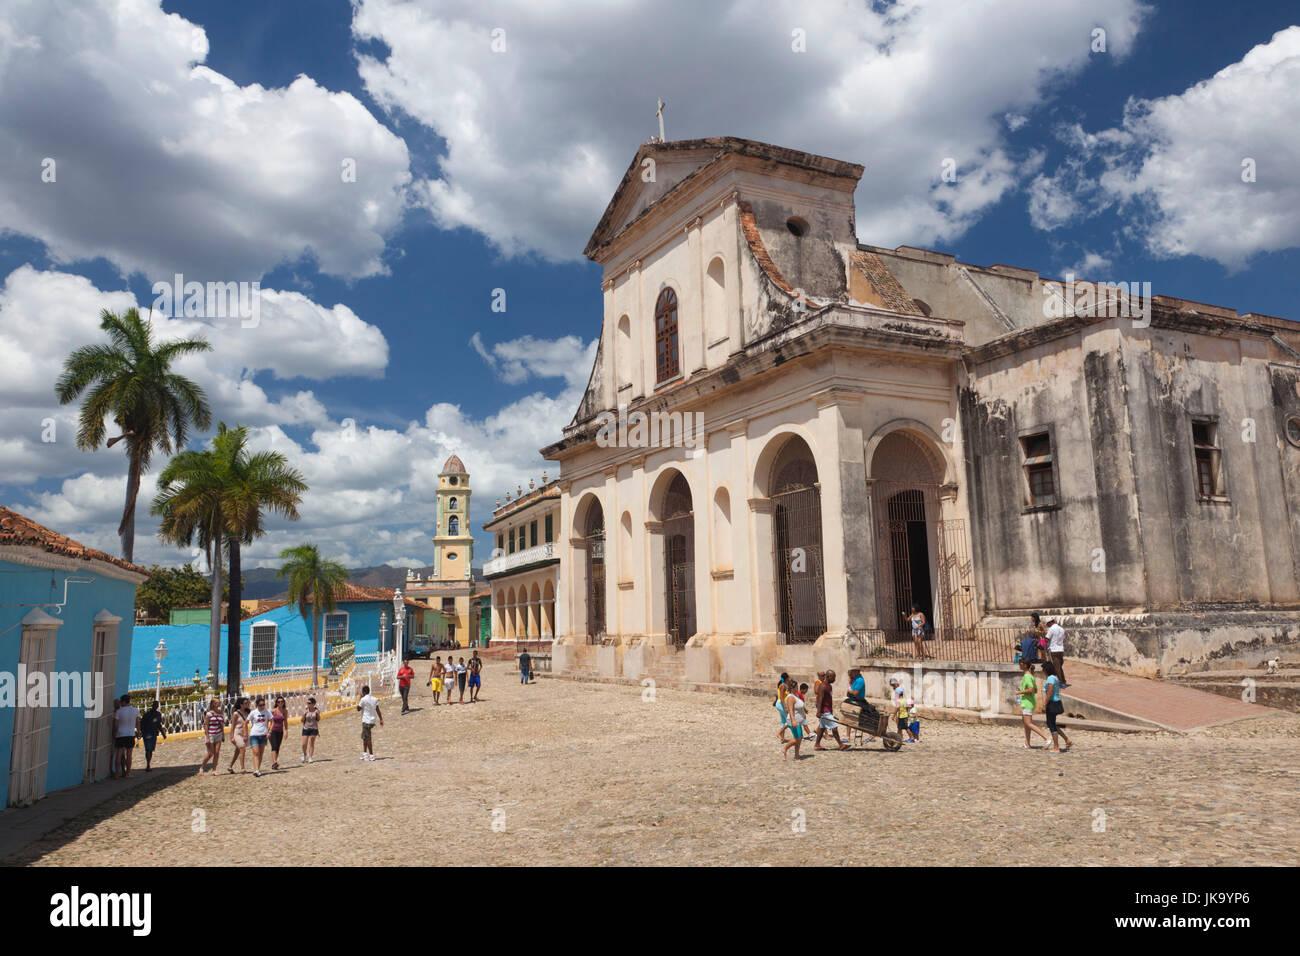 Cuba, Sancti Spiritus Province, Trinidad, Iglesia Parroquial de la Santisima Trinidad, Holy Trinity Church Stock Photo